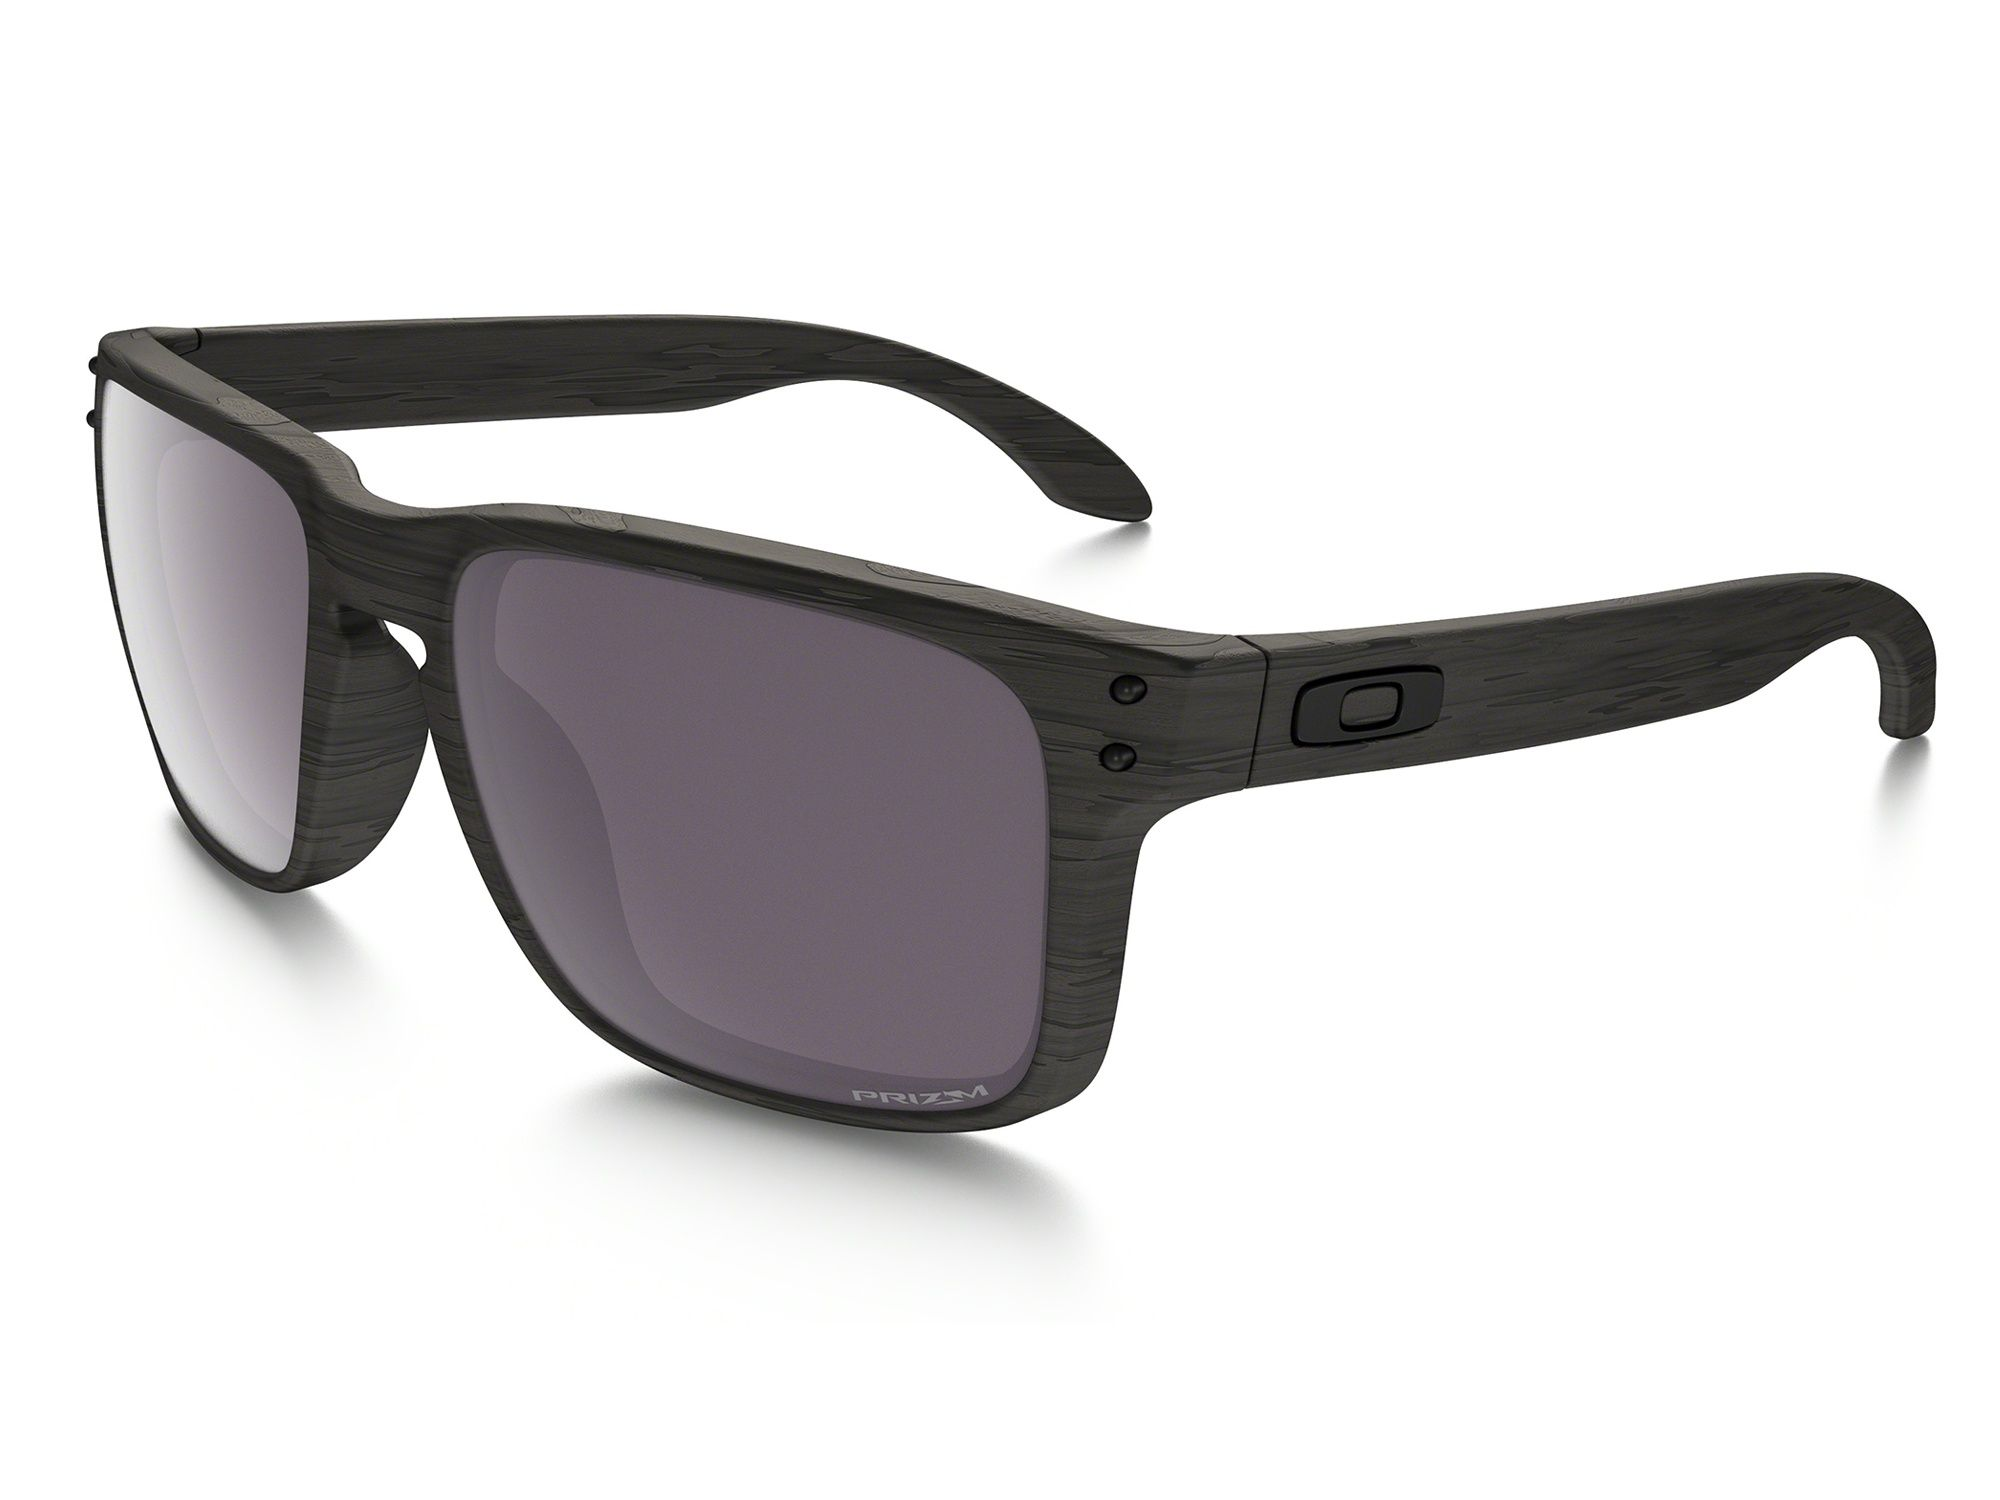 Conheça na loja oficial online da Oakley a linha completa de óculos de sol  e de 5c85f35b45